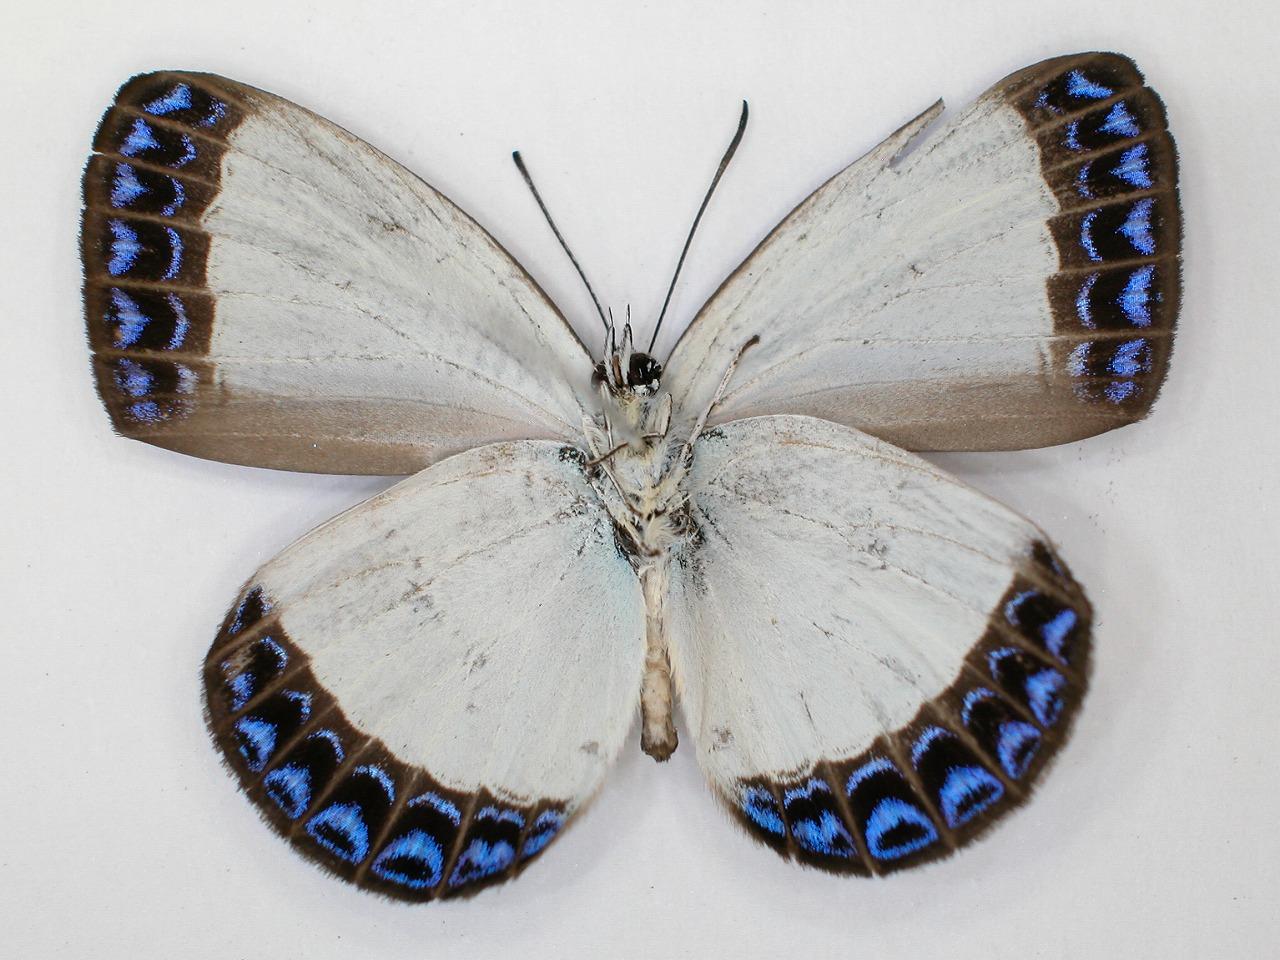 https://www.hitohaku.jp/material/l-material/butterfly-wing/5-lycaenidae/B1-273589_B.jpg